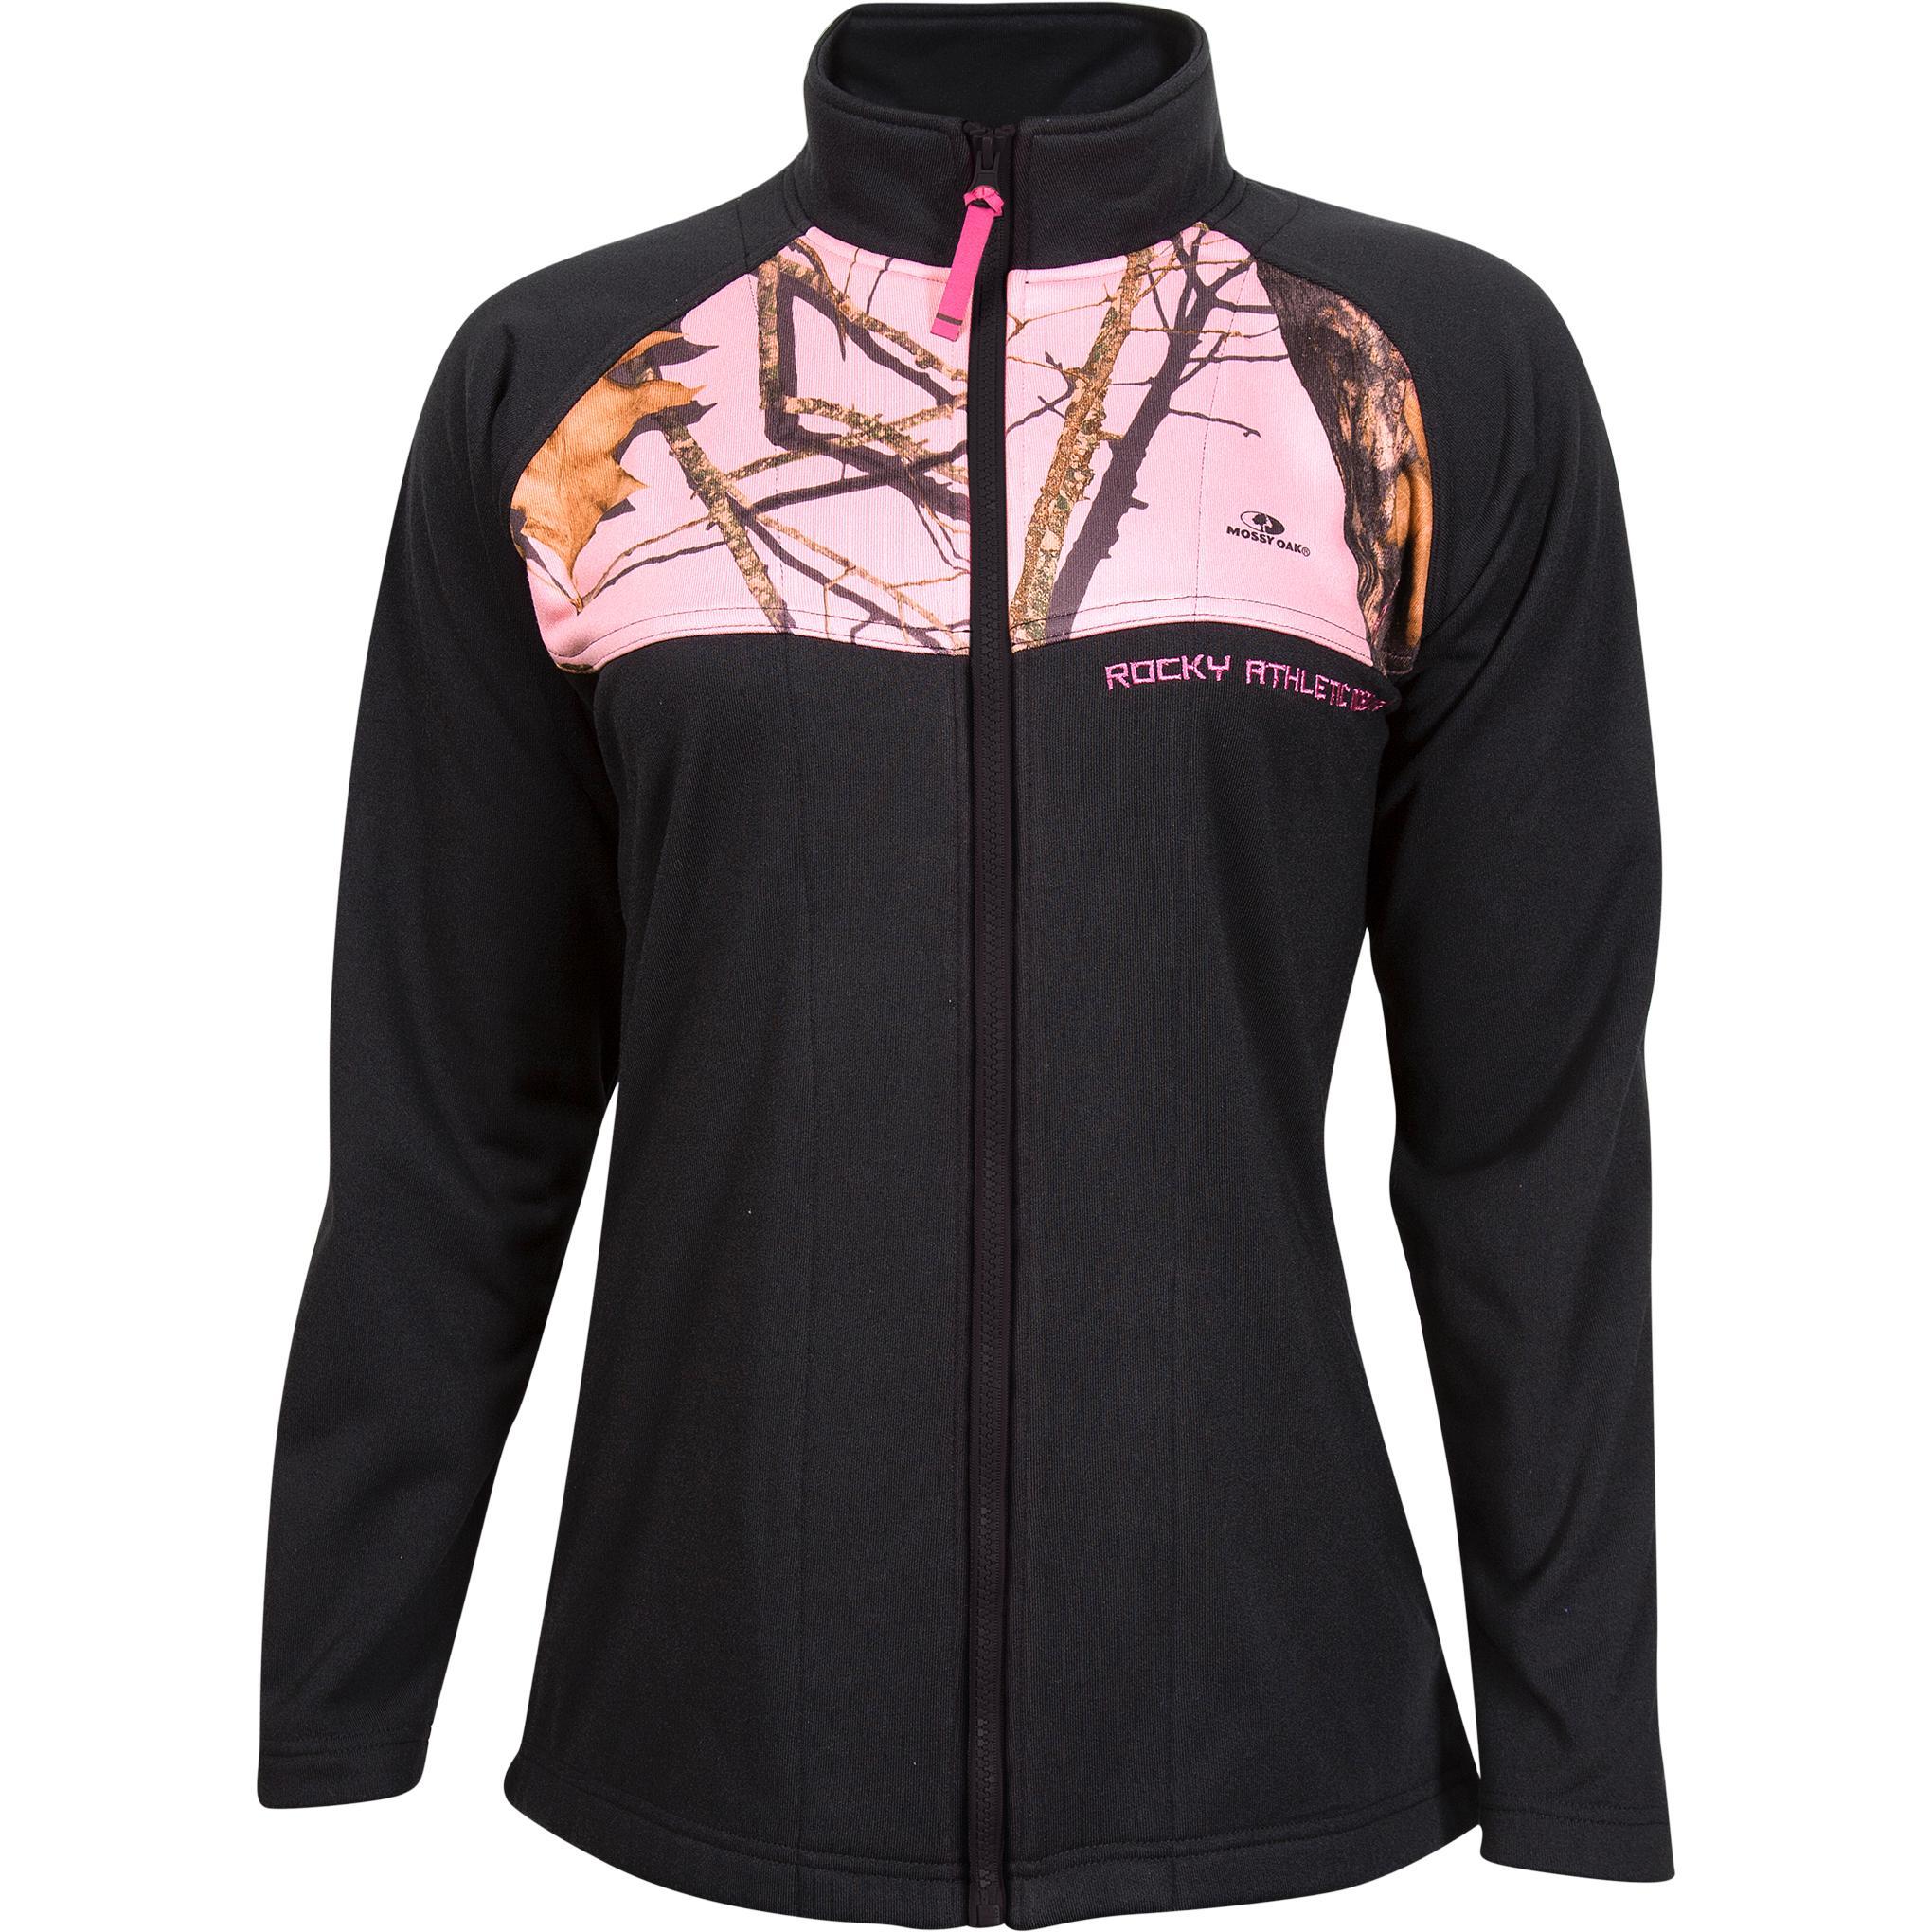 Women's Full Zip REALTREE CAMO Fleece Jacket w/ FREE SHIPPING